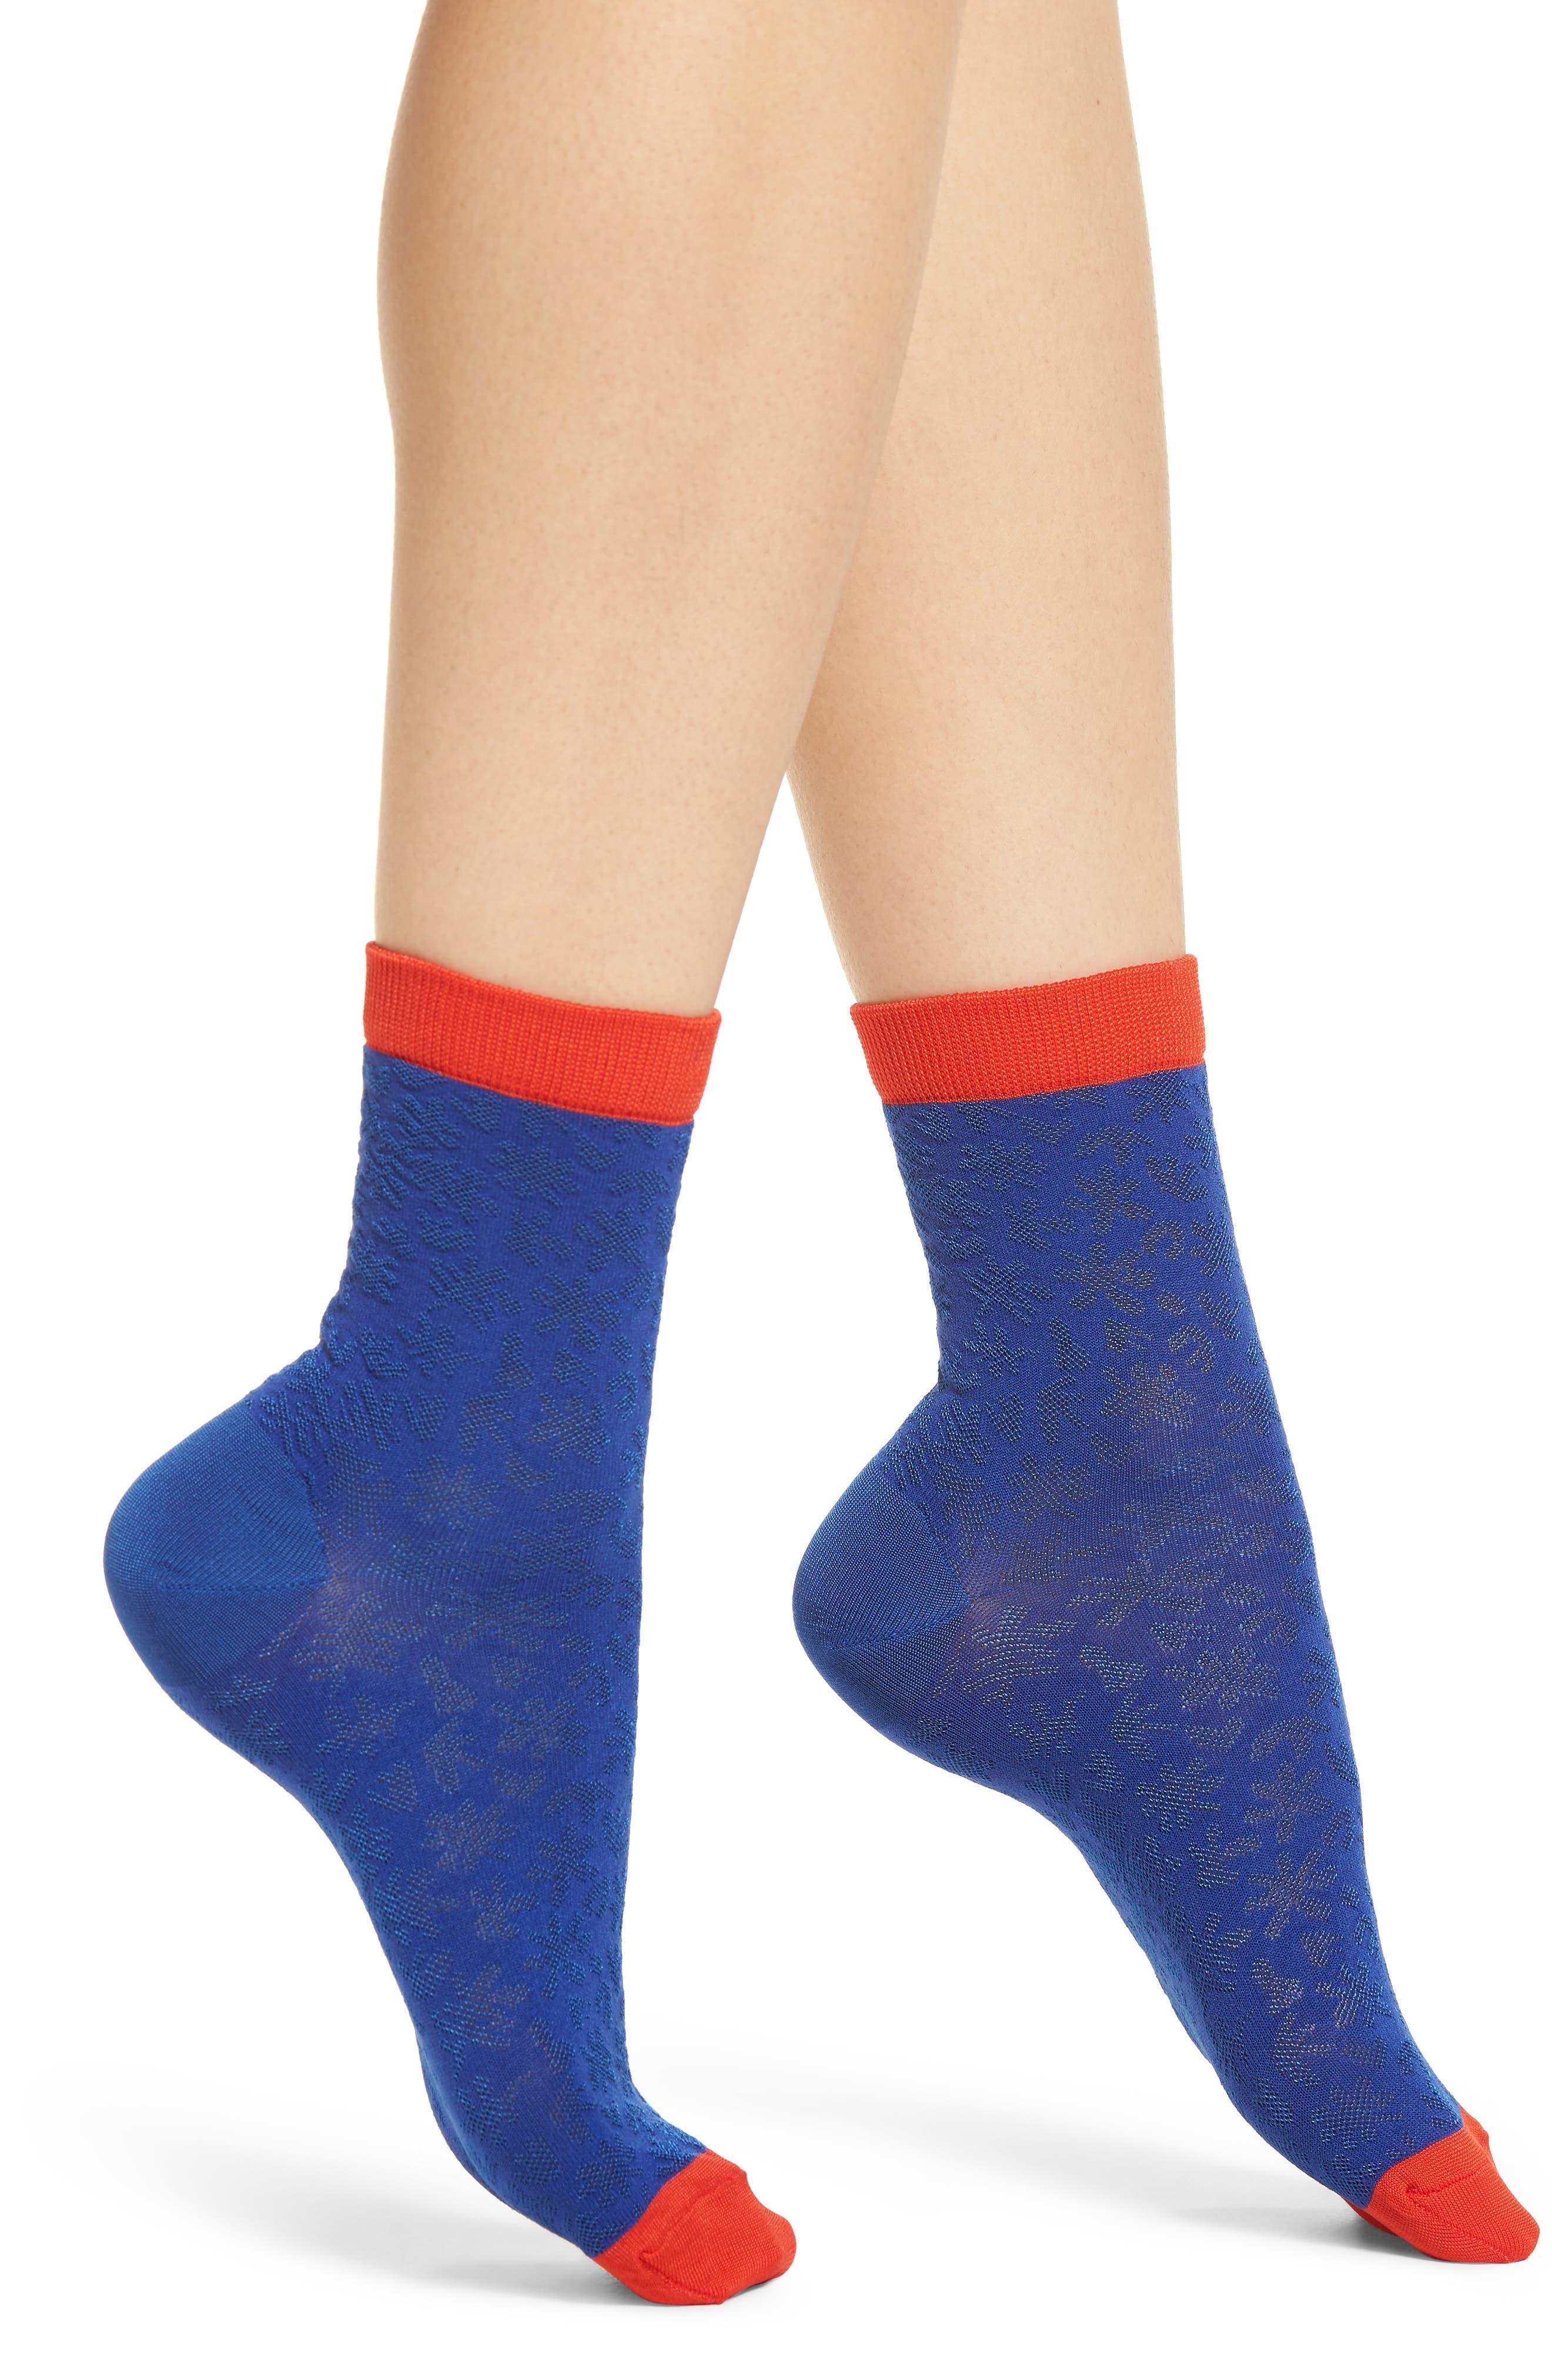 Lotta Ankle Socks,                             Main thumbnail 1, color,                             BLUE